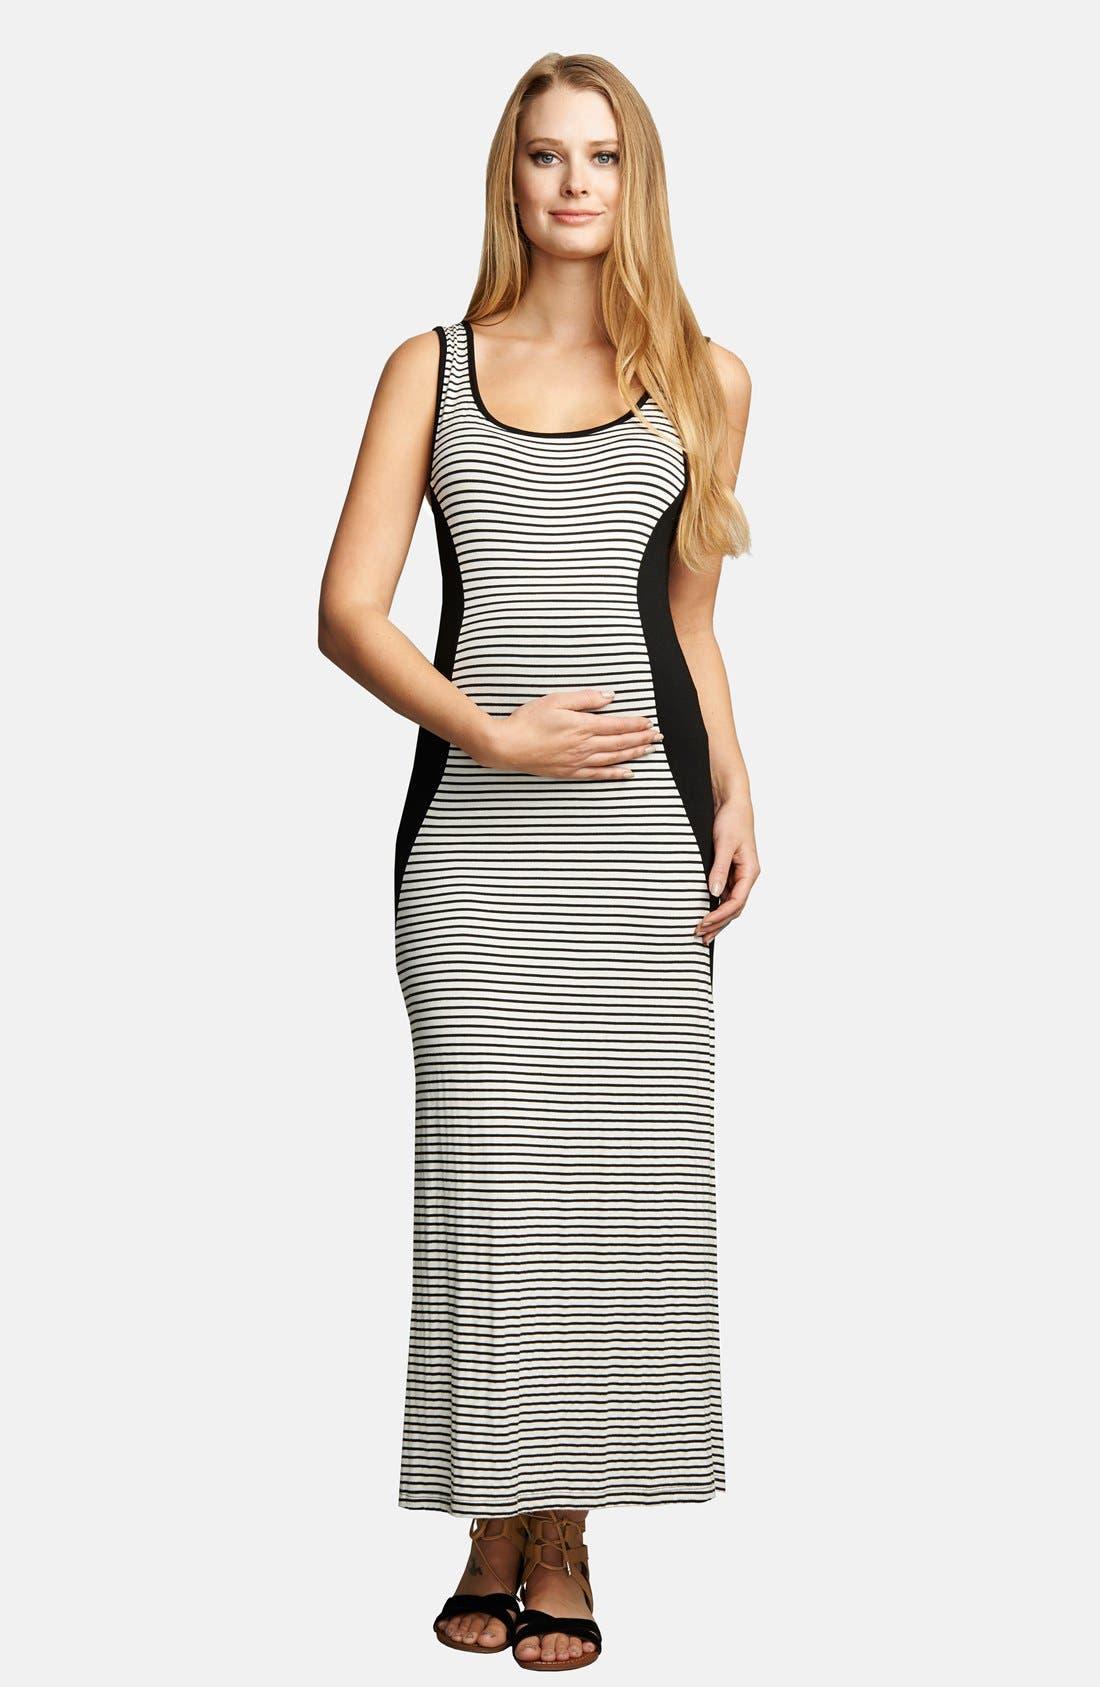 Scoop Neck Maxi Lightweight Maternity Dress,                         Main,                         color, 001